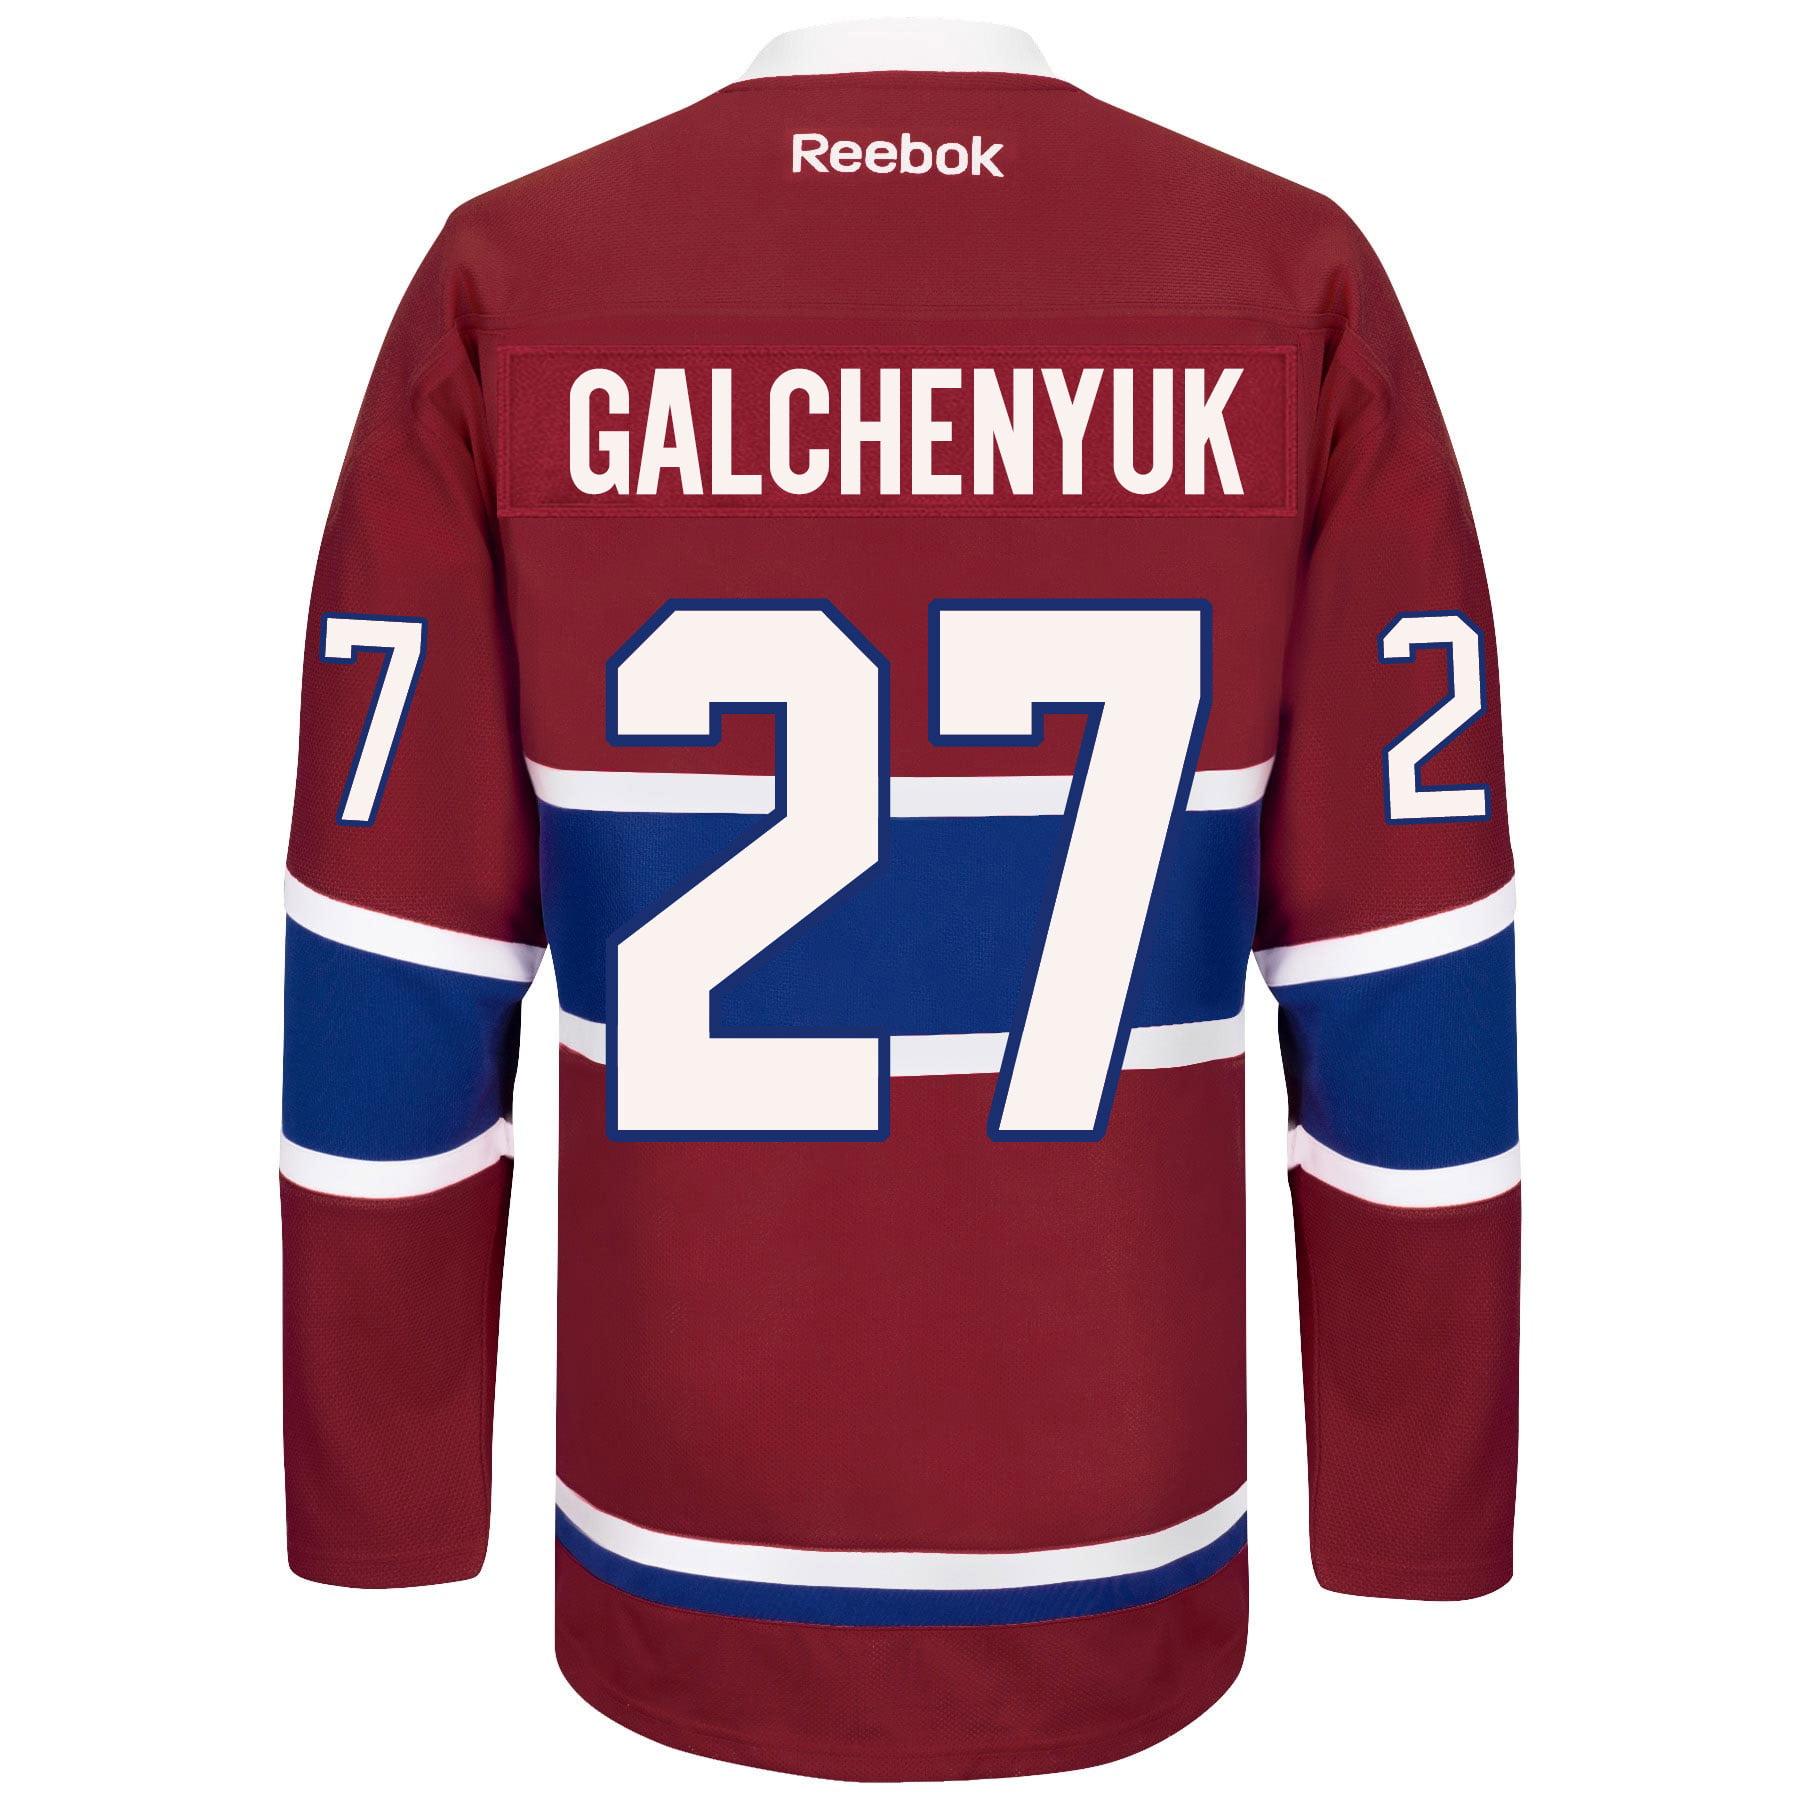 super popular 0ceb3 d4973 Alex Galchenyuk Montreal Canadiens Reebok Premier Replica ...